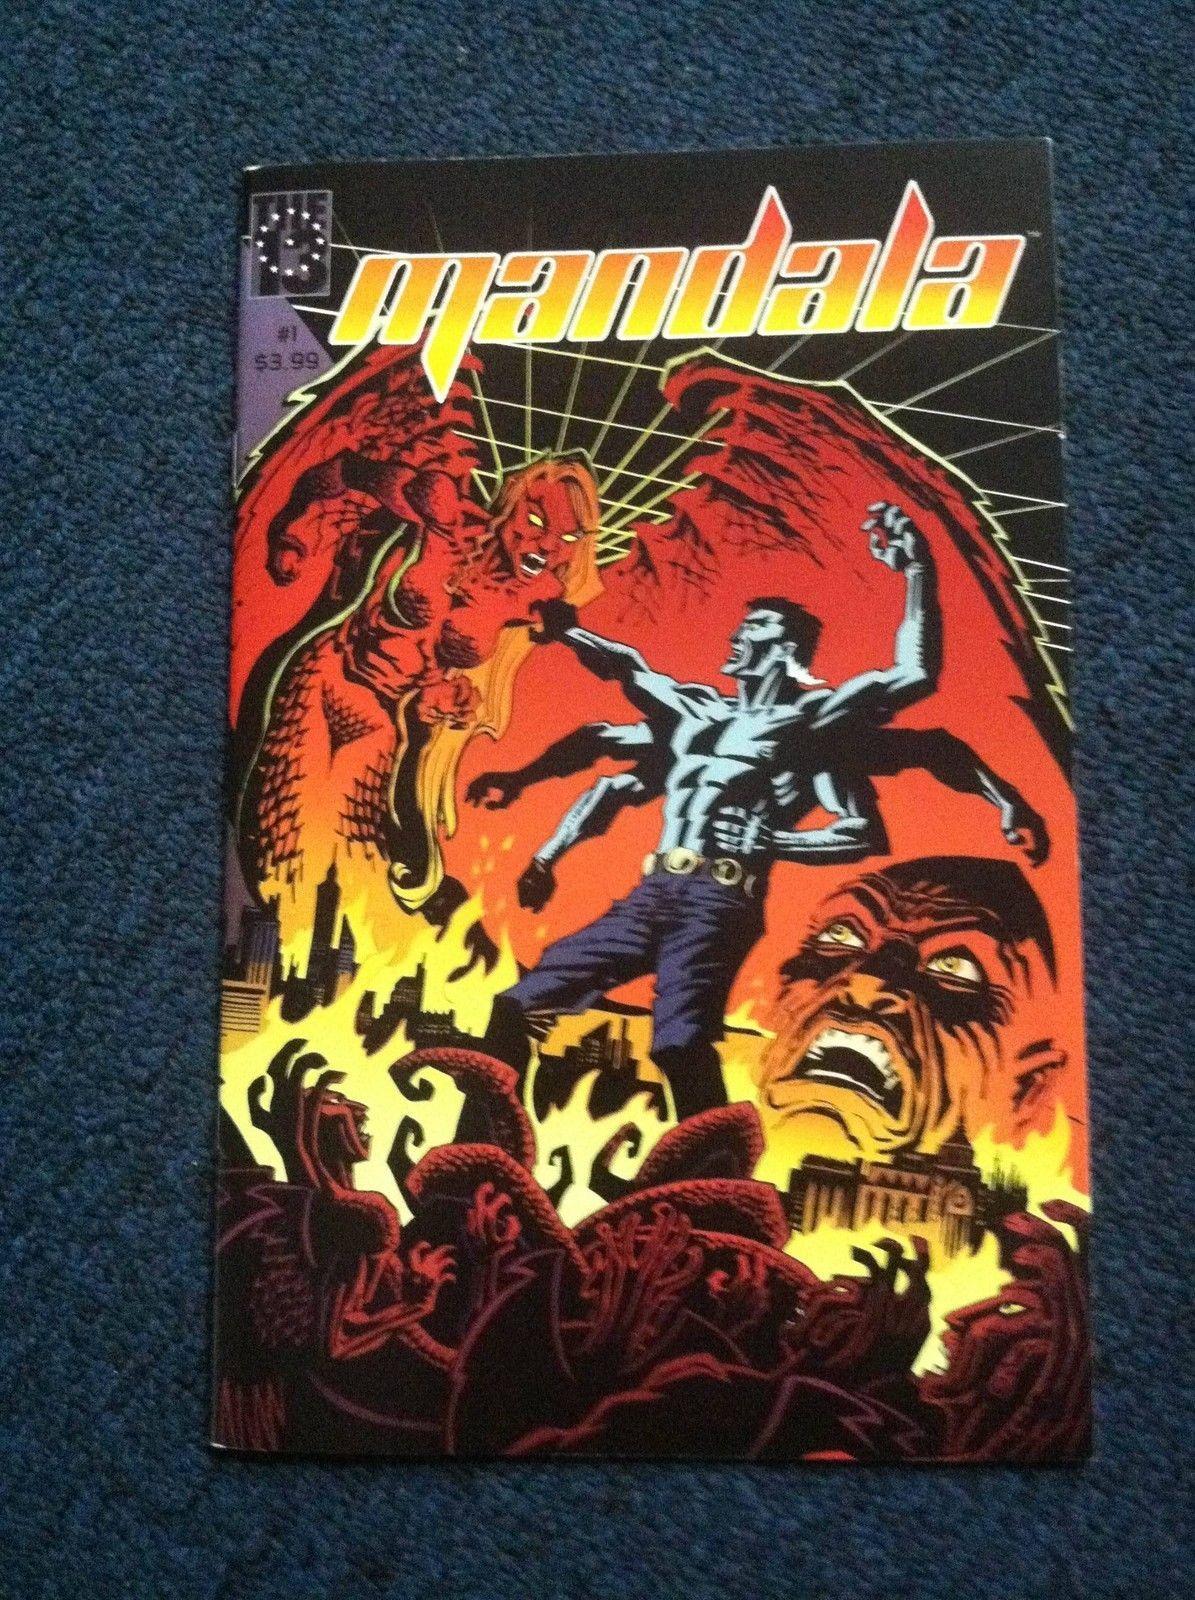 MANDALA #1 Retailer Preview Edition